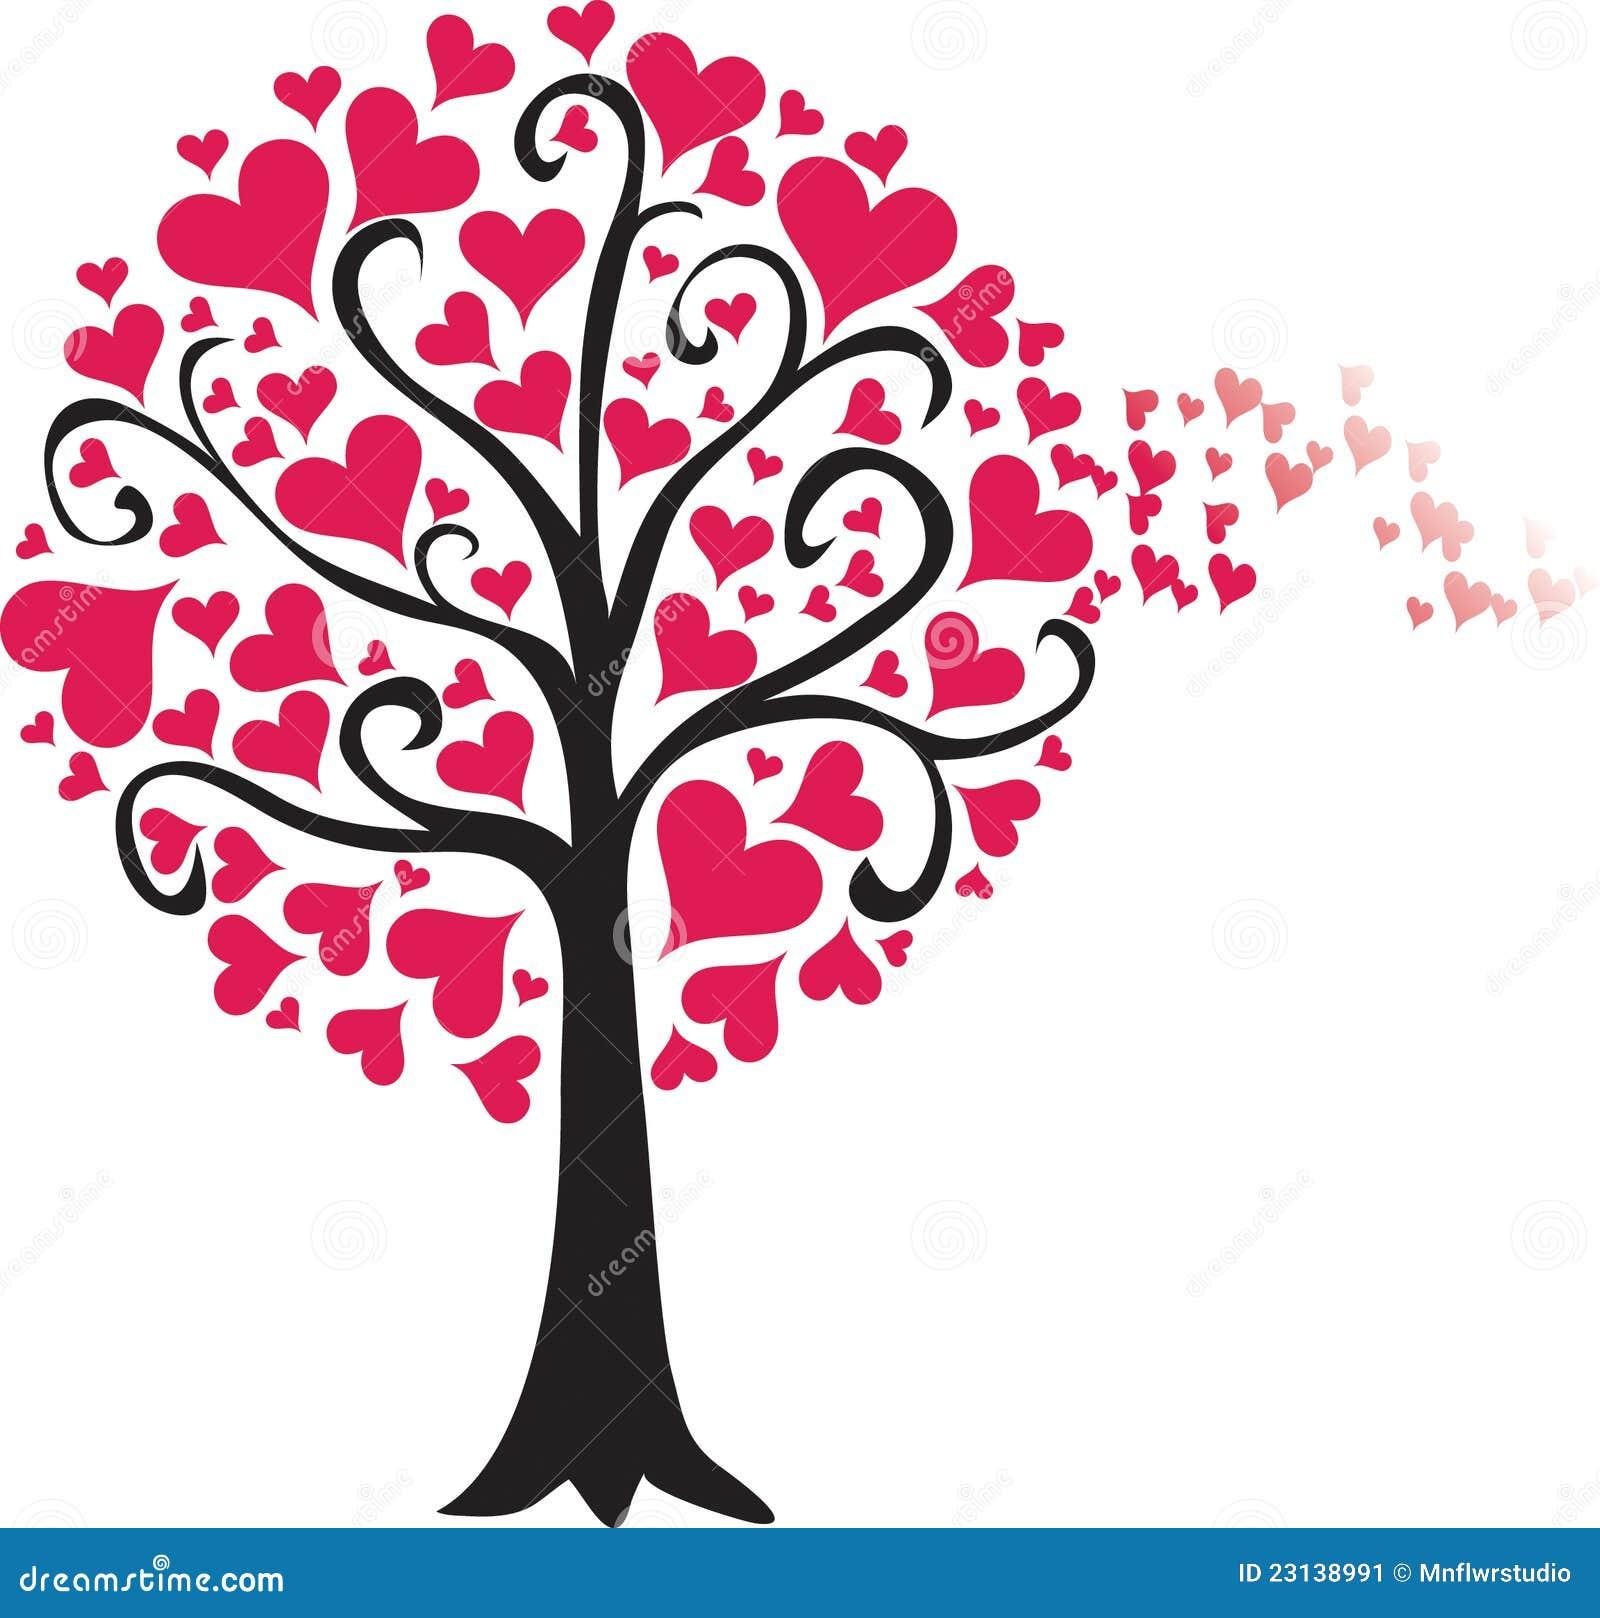 Valentine Tree Breeze Stock Image - Image: 23138991